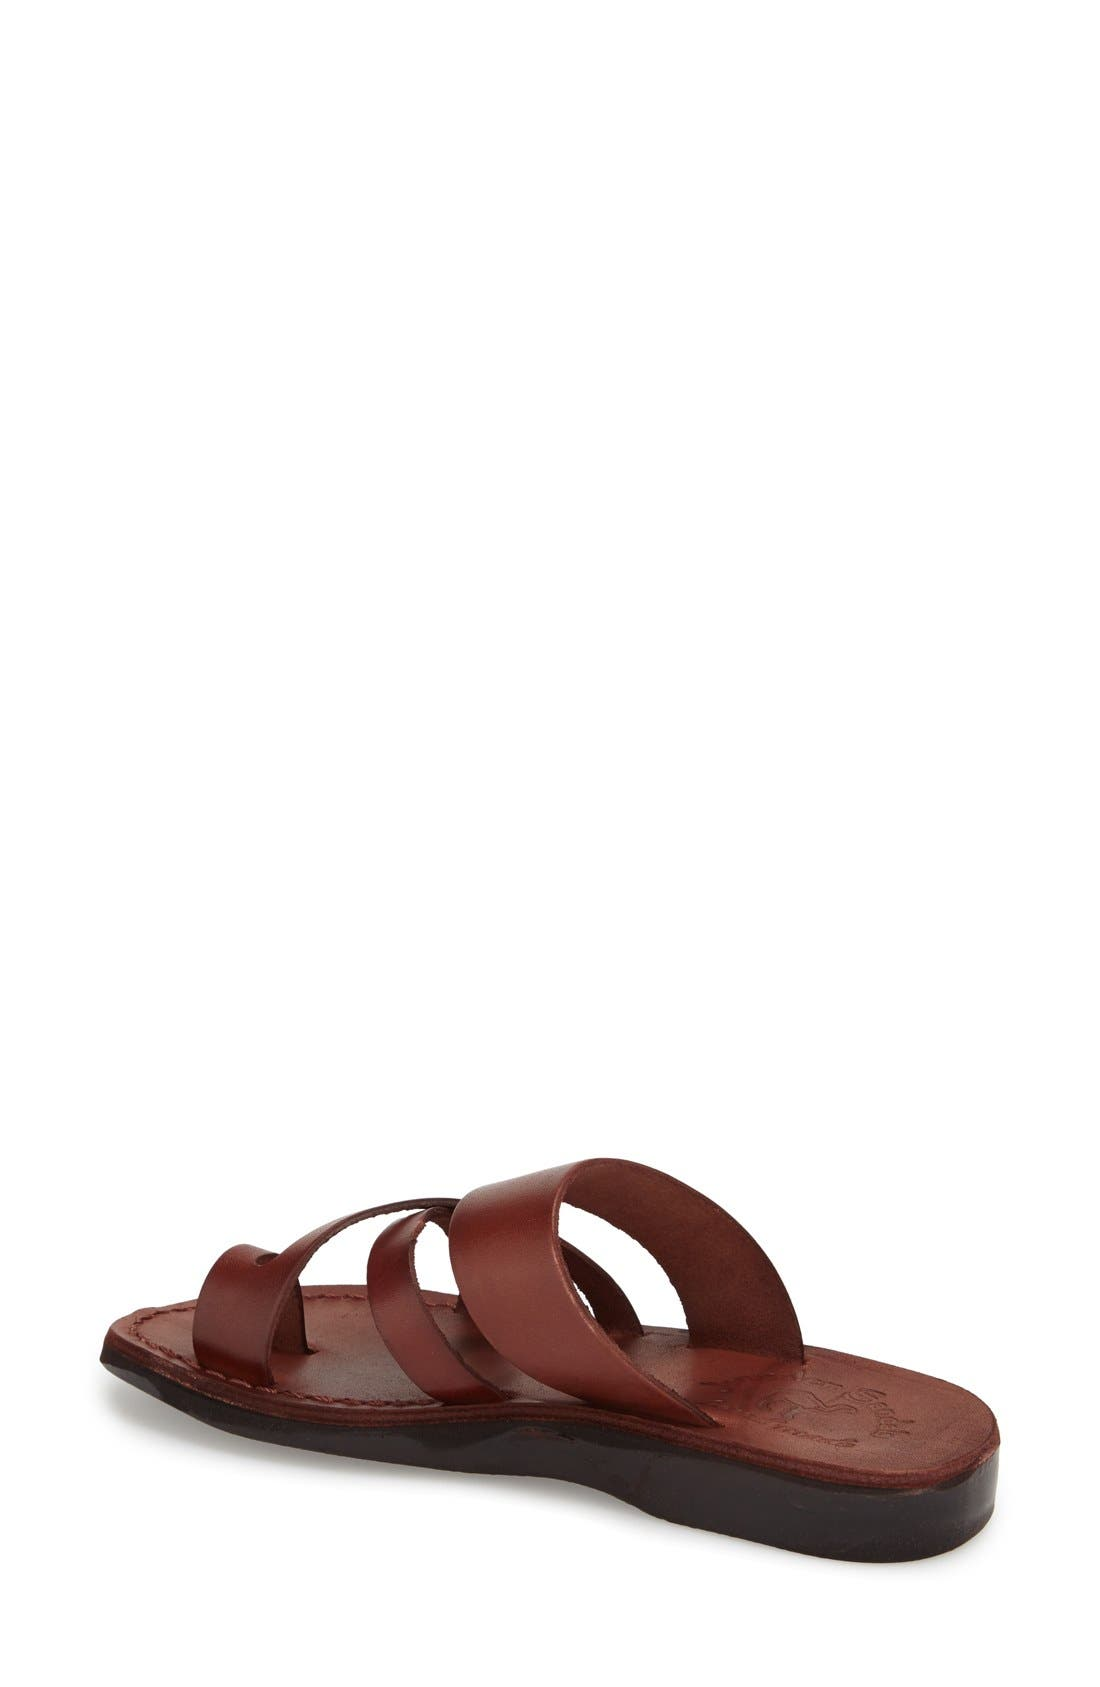 'The Good Shepard' Leather Sandal,                             Alternate thumbnail 13, color,